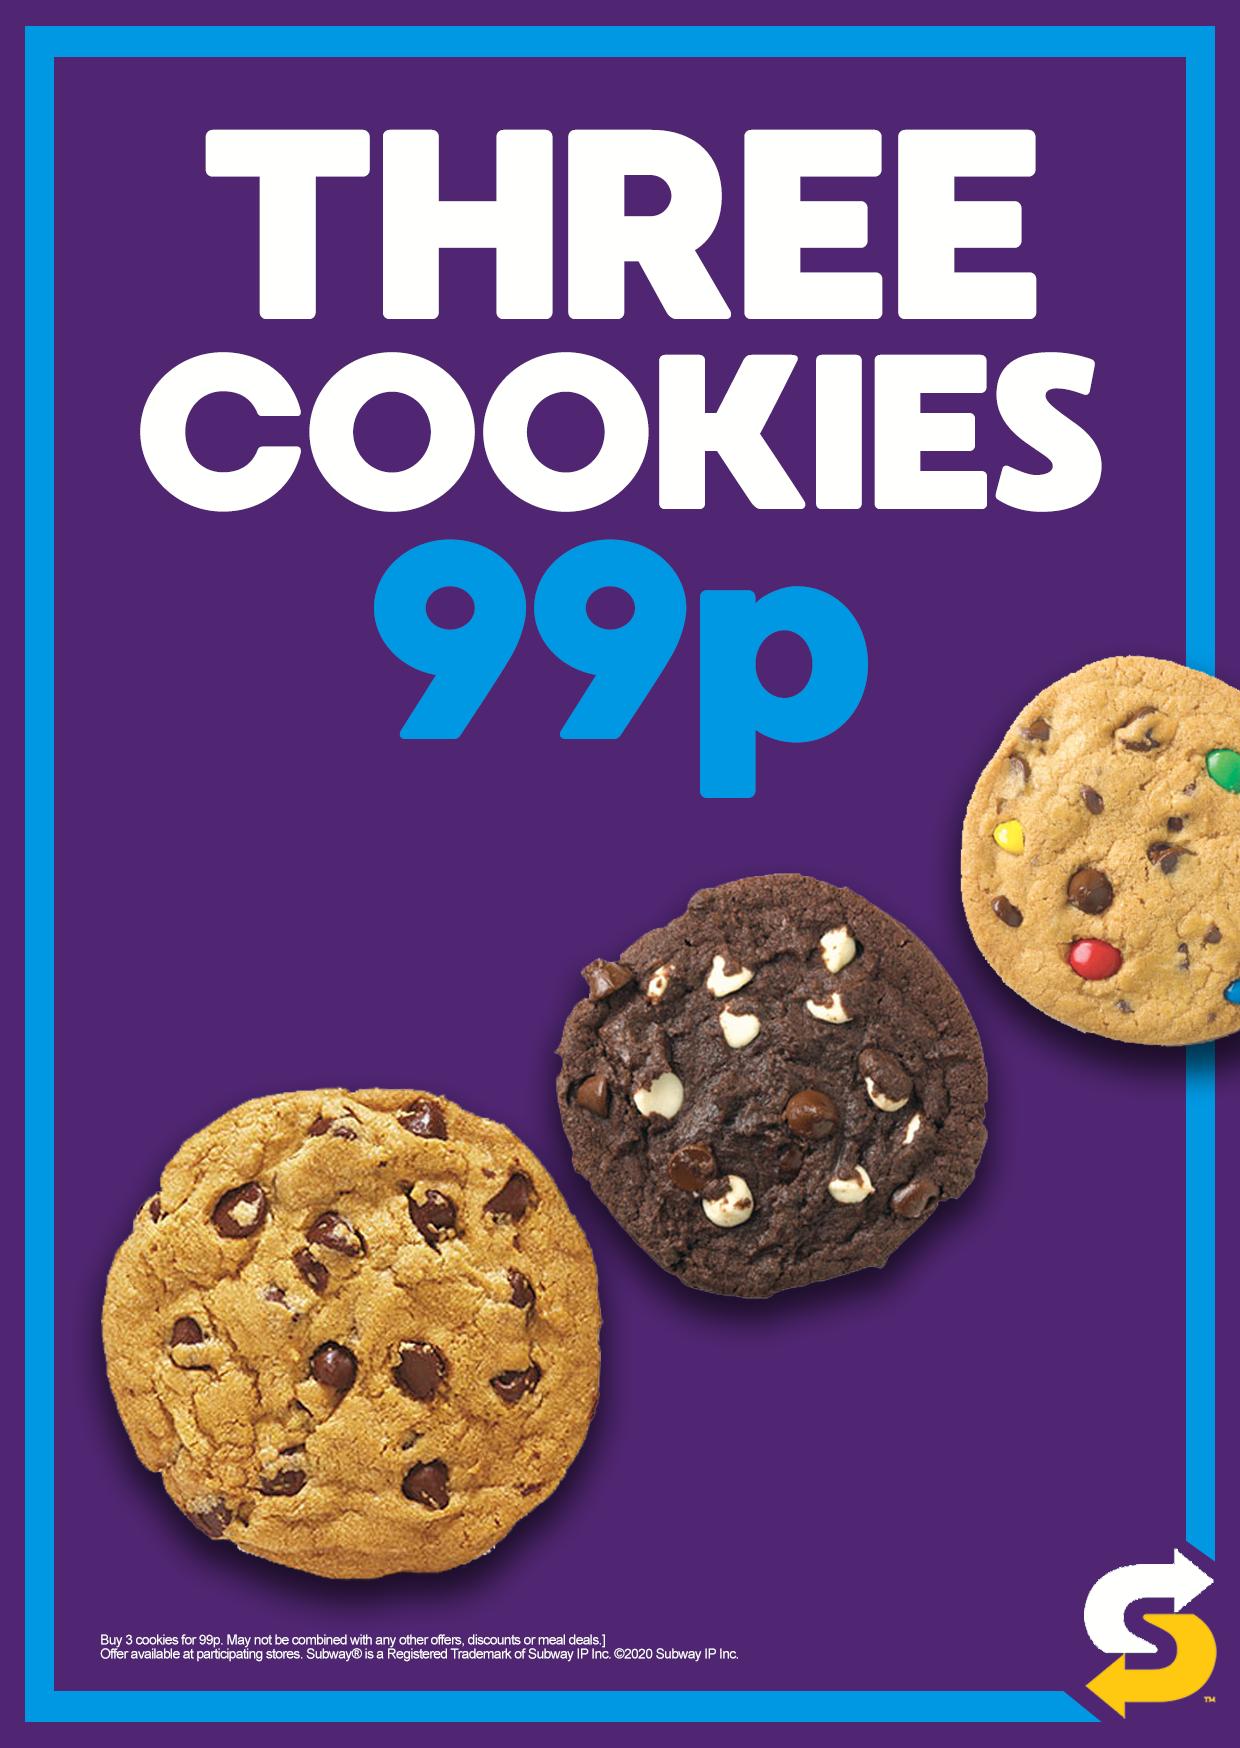 THREE COOKIES 99P